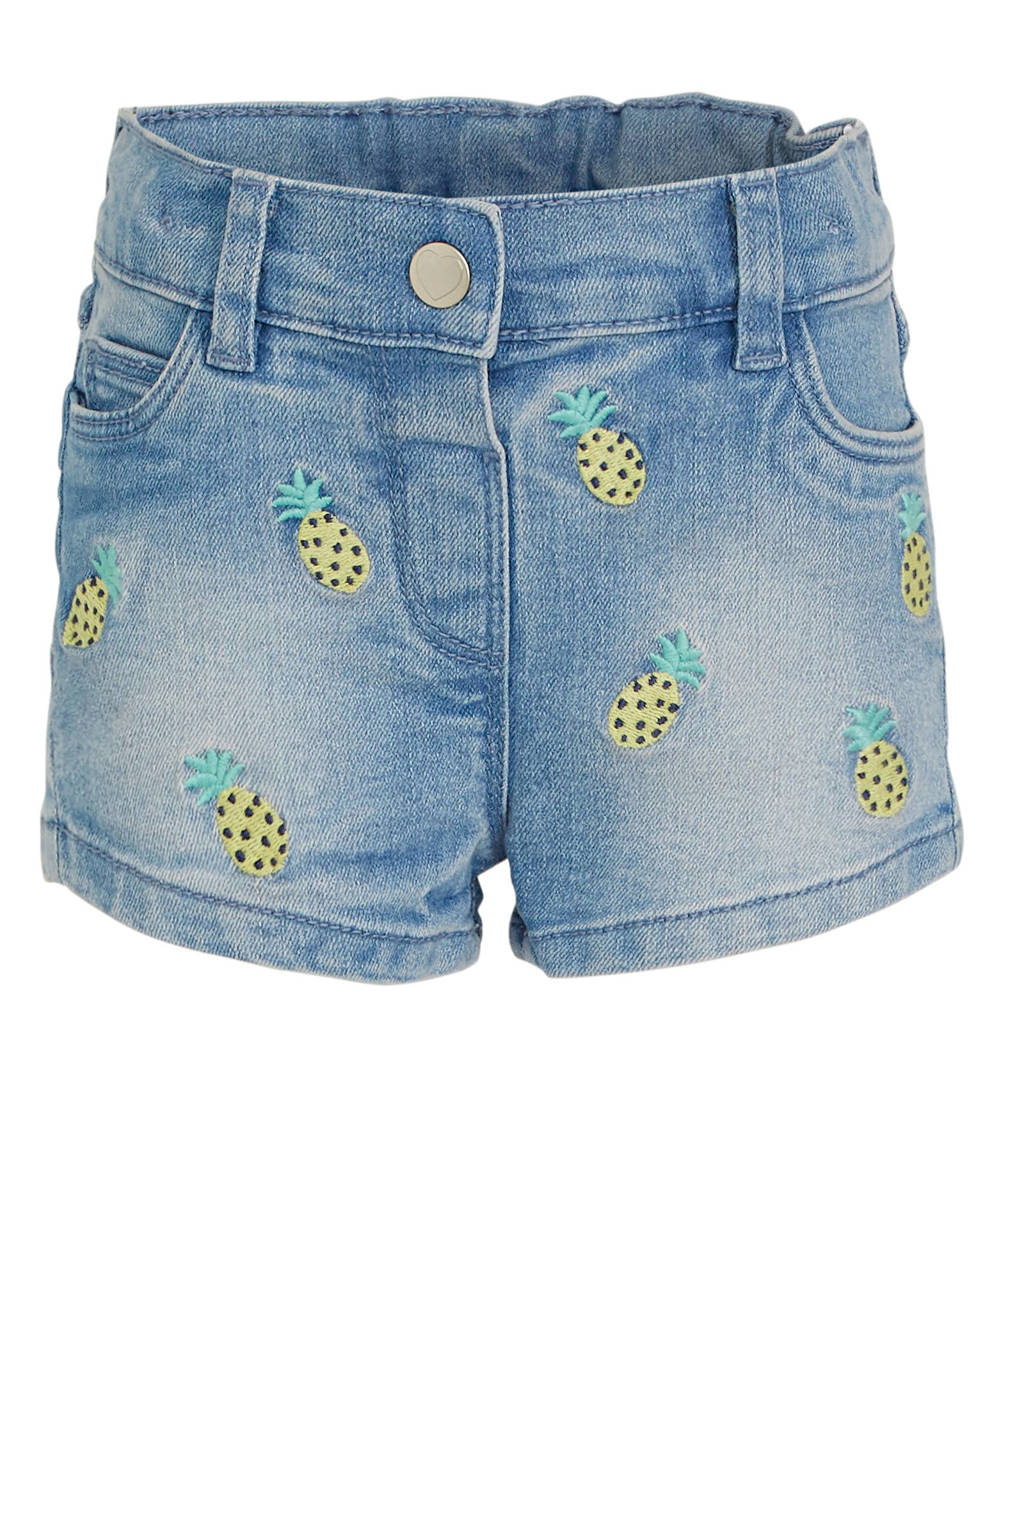 C&A Baby Club jeans short met all over print en borduursels light denim, Light denim